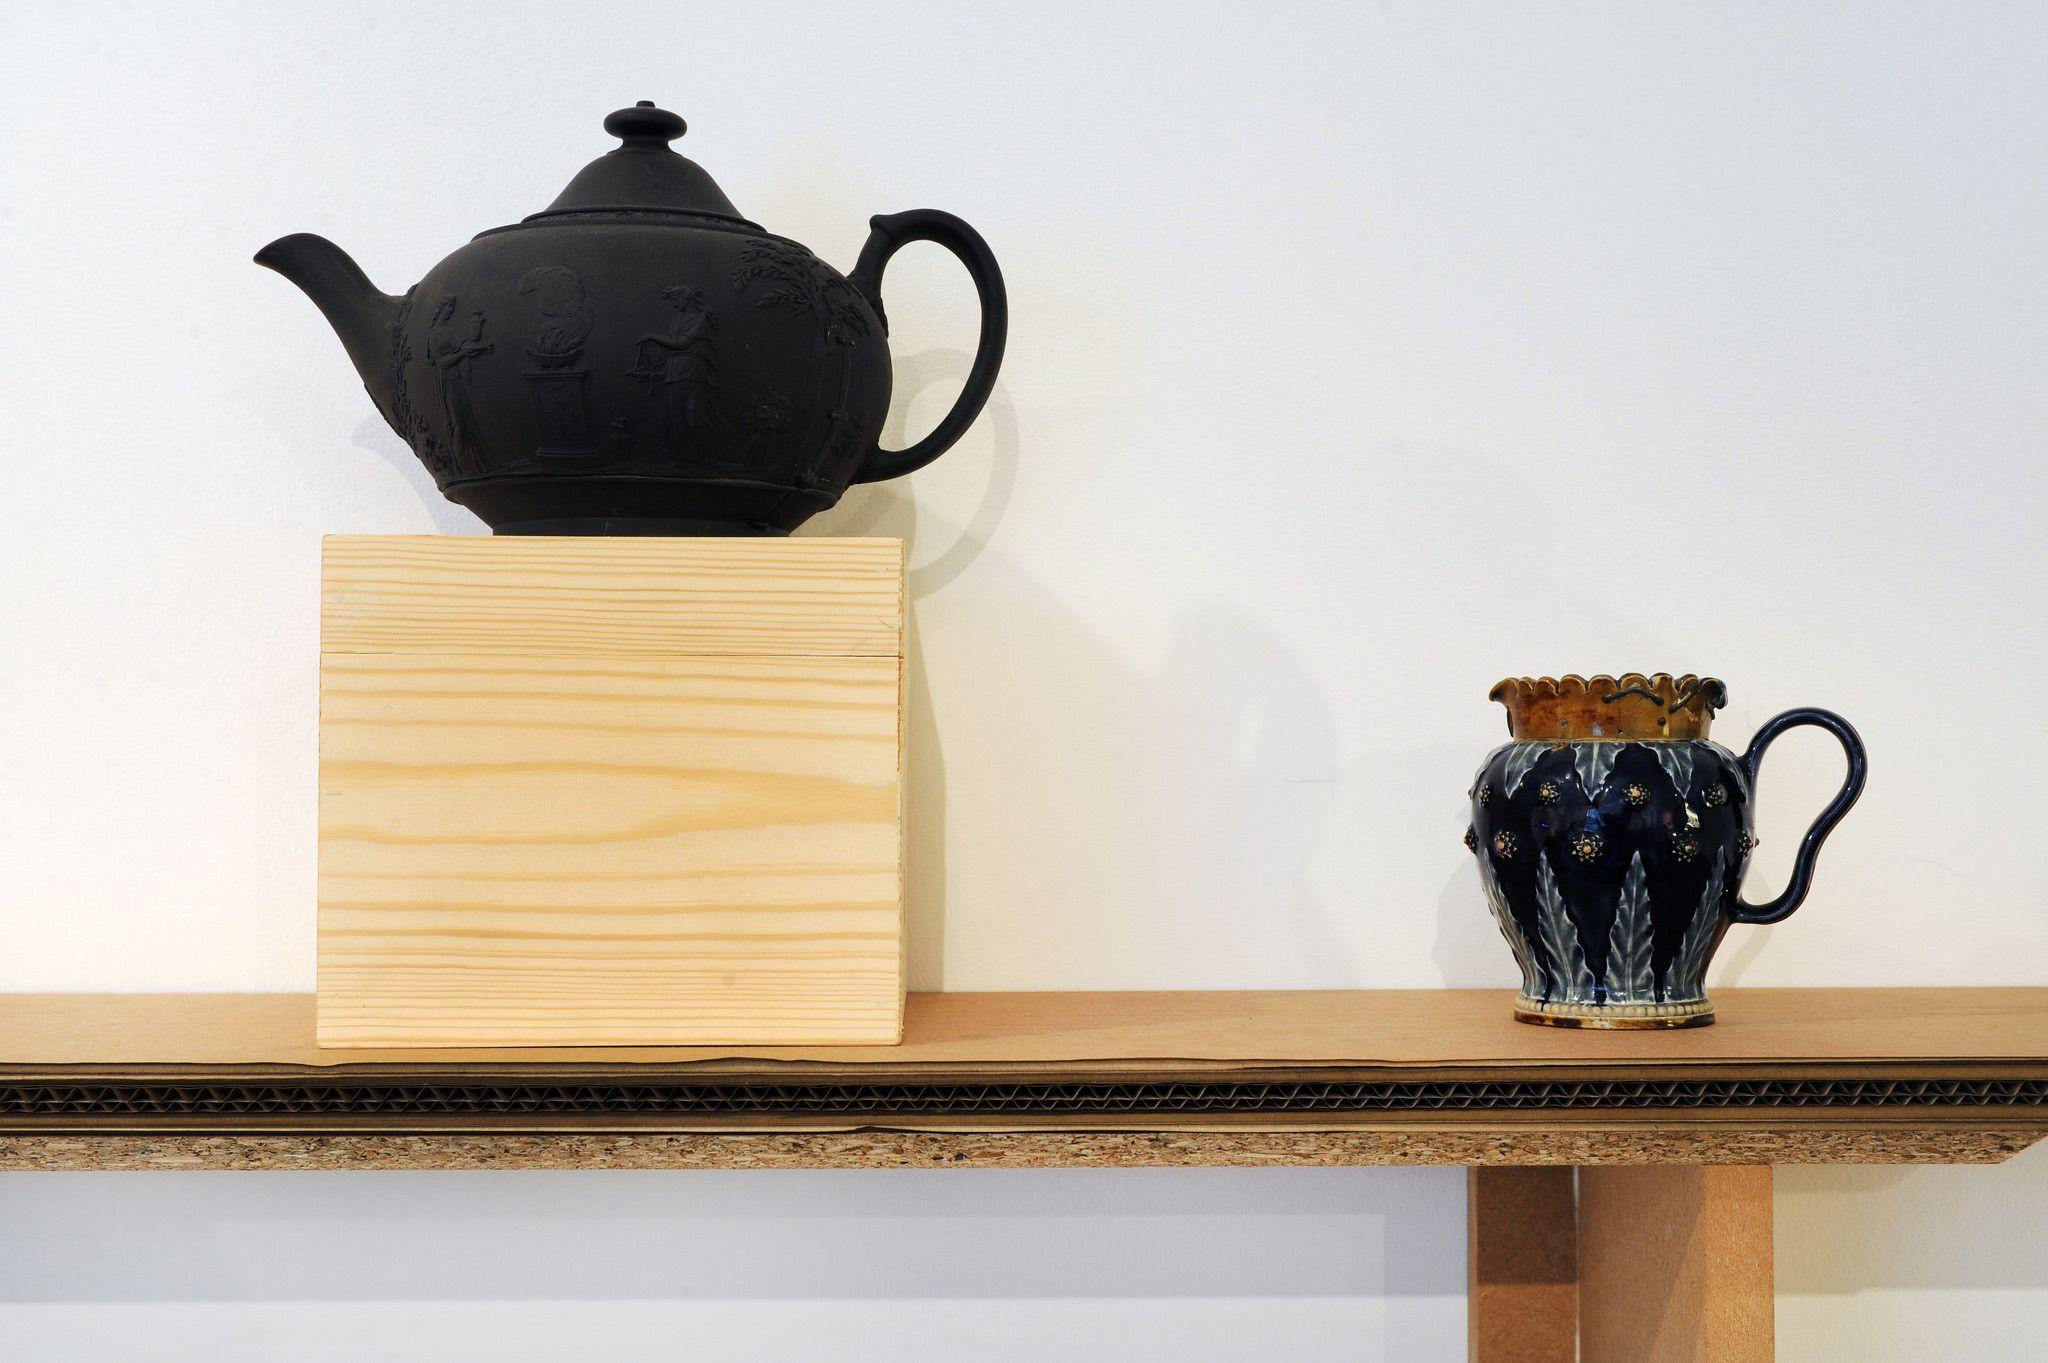 Basalt Teapot 1840, Doulton Jug 1890. \'Politics of Craft: After Ford ...